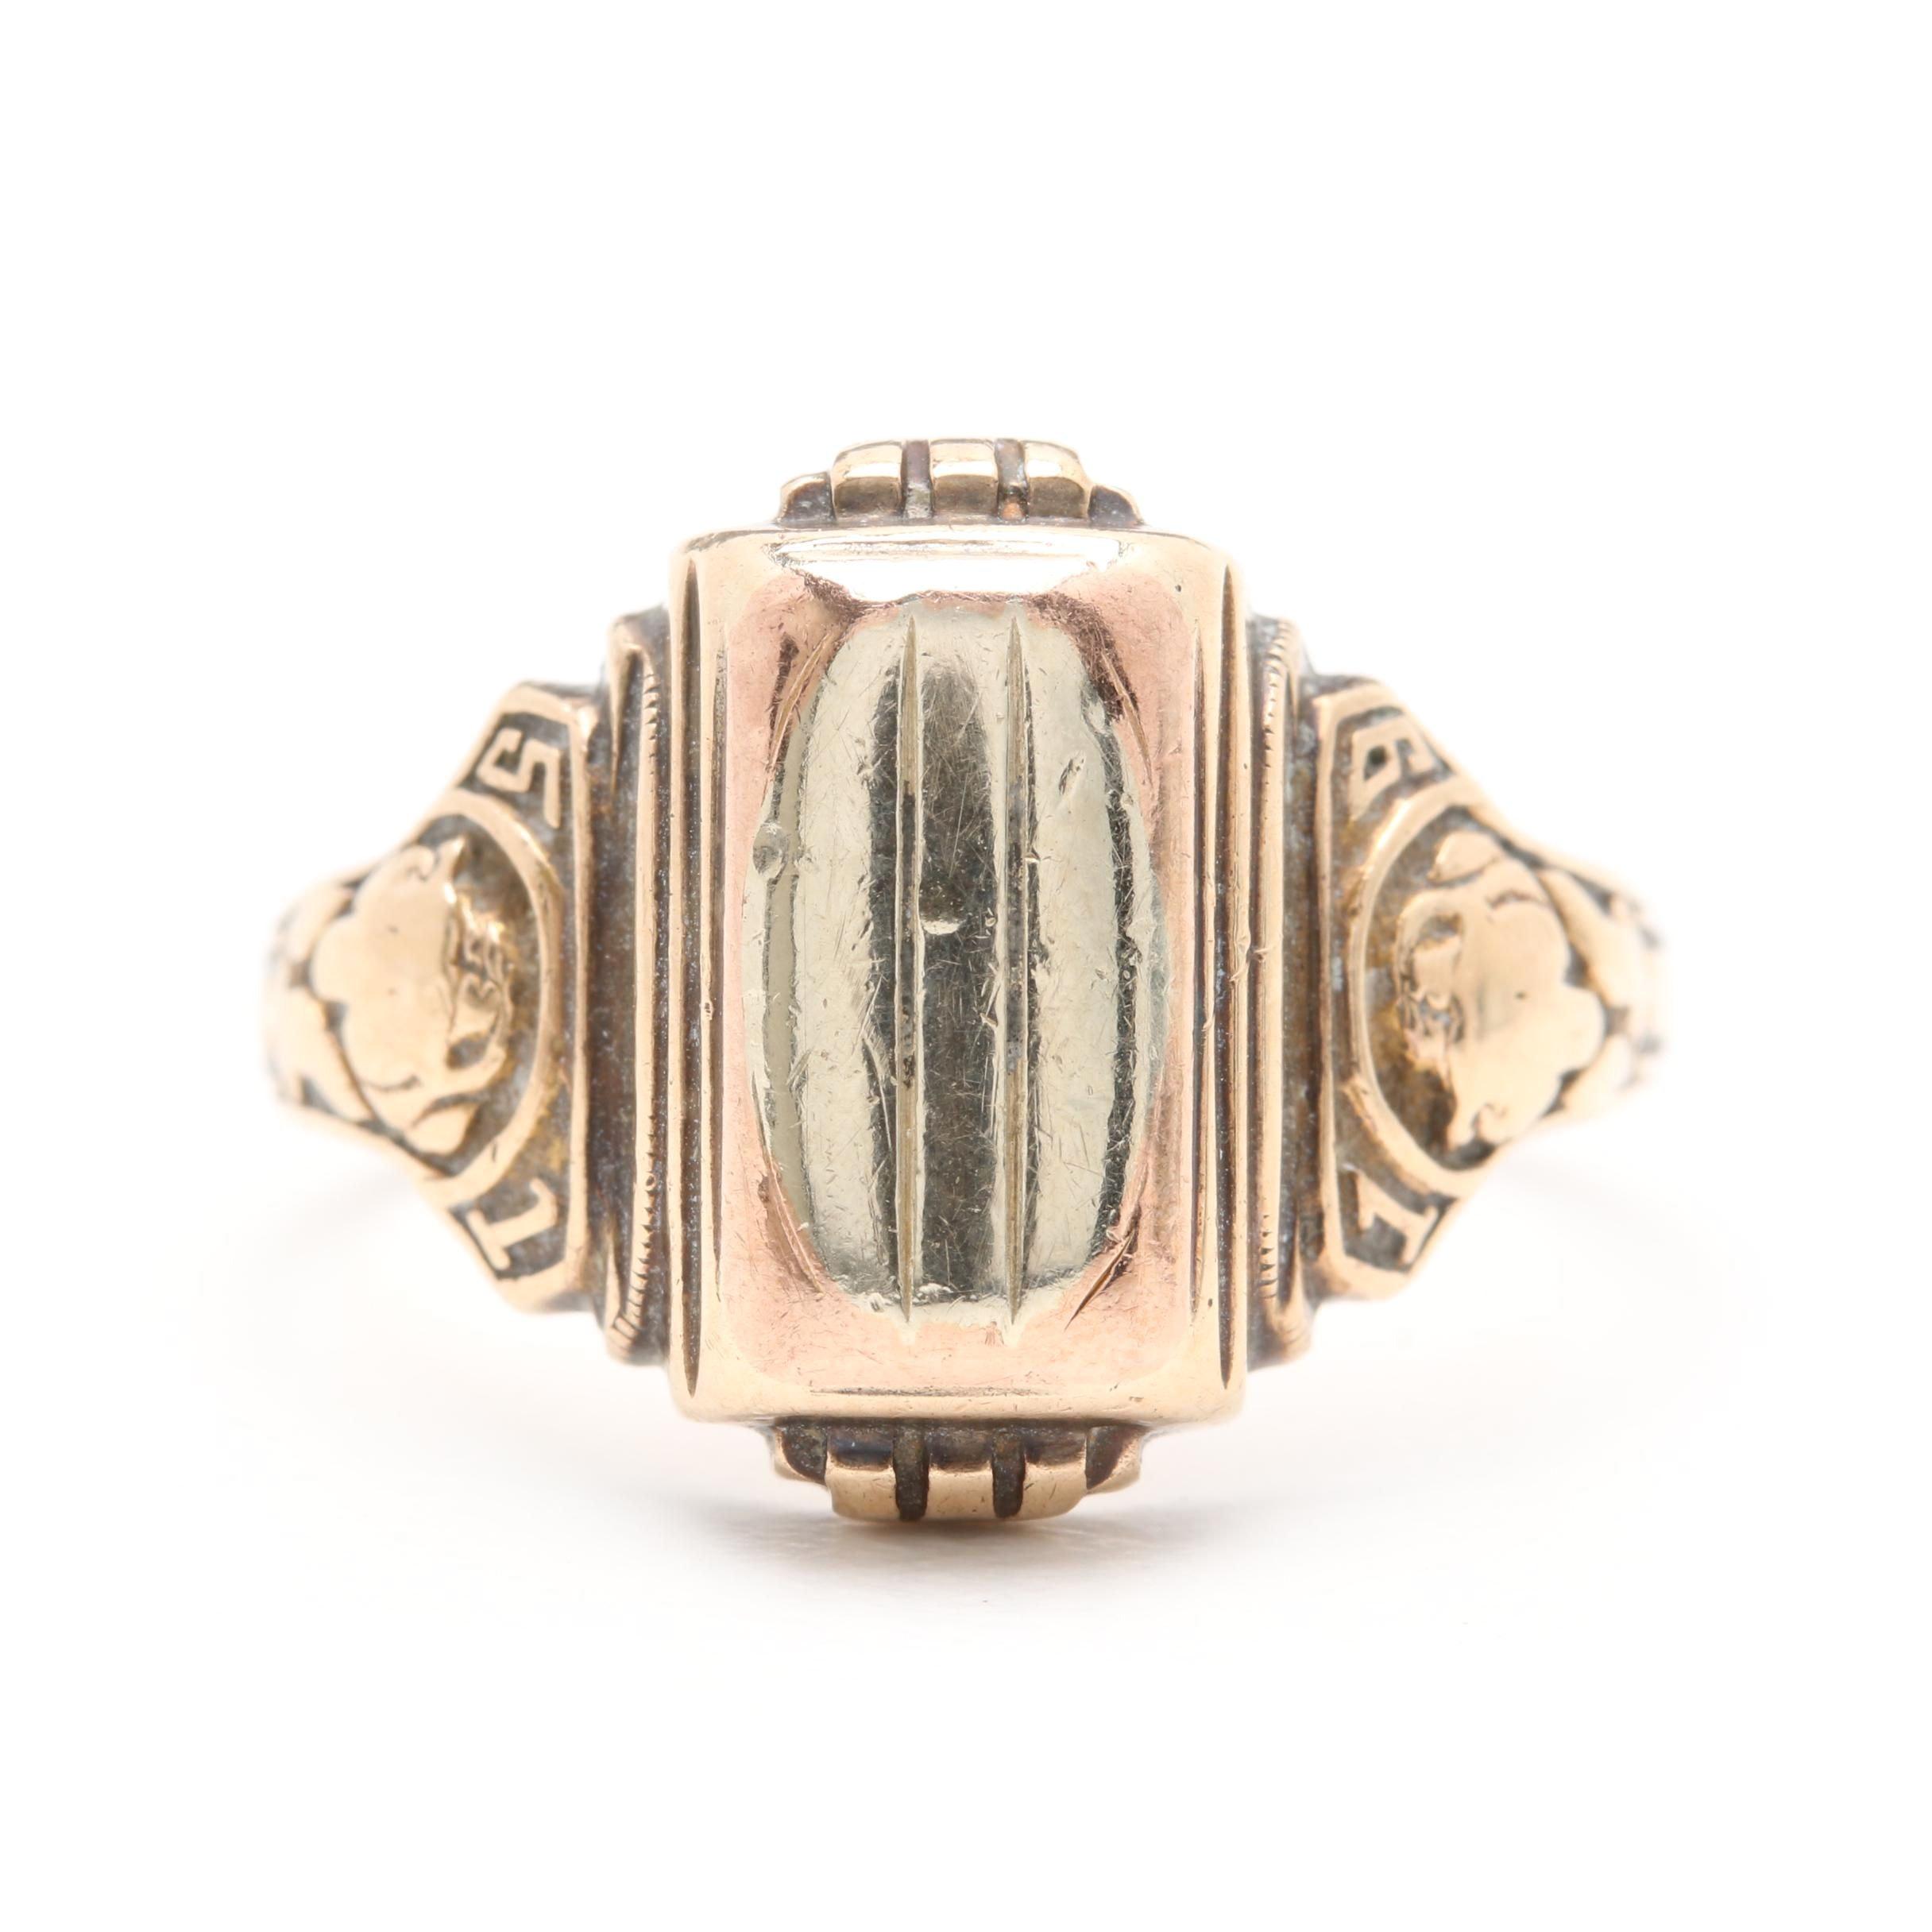 1951 10K Yellow Gold Class Ring